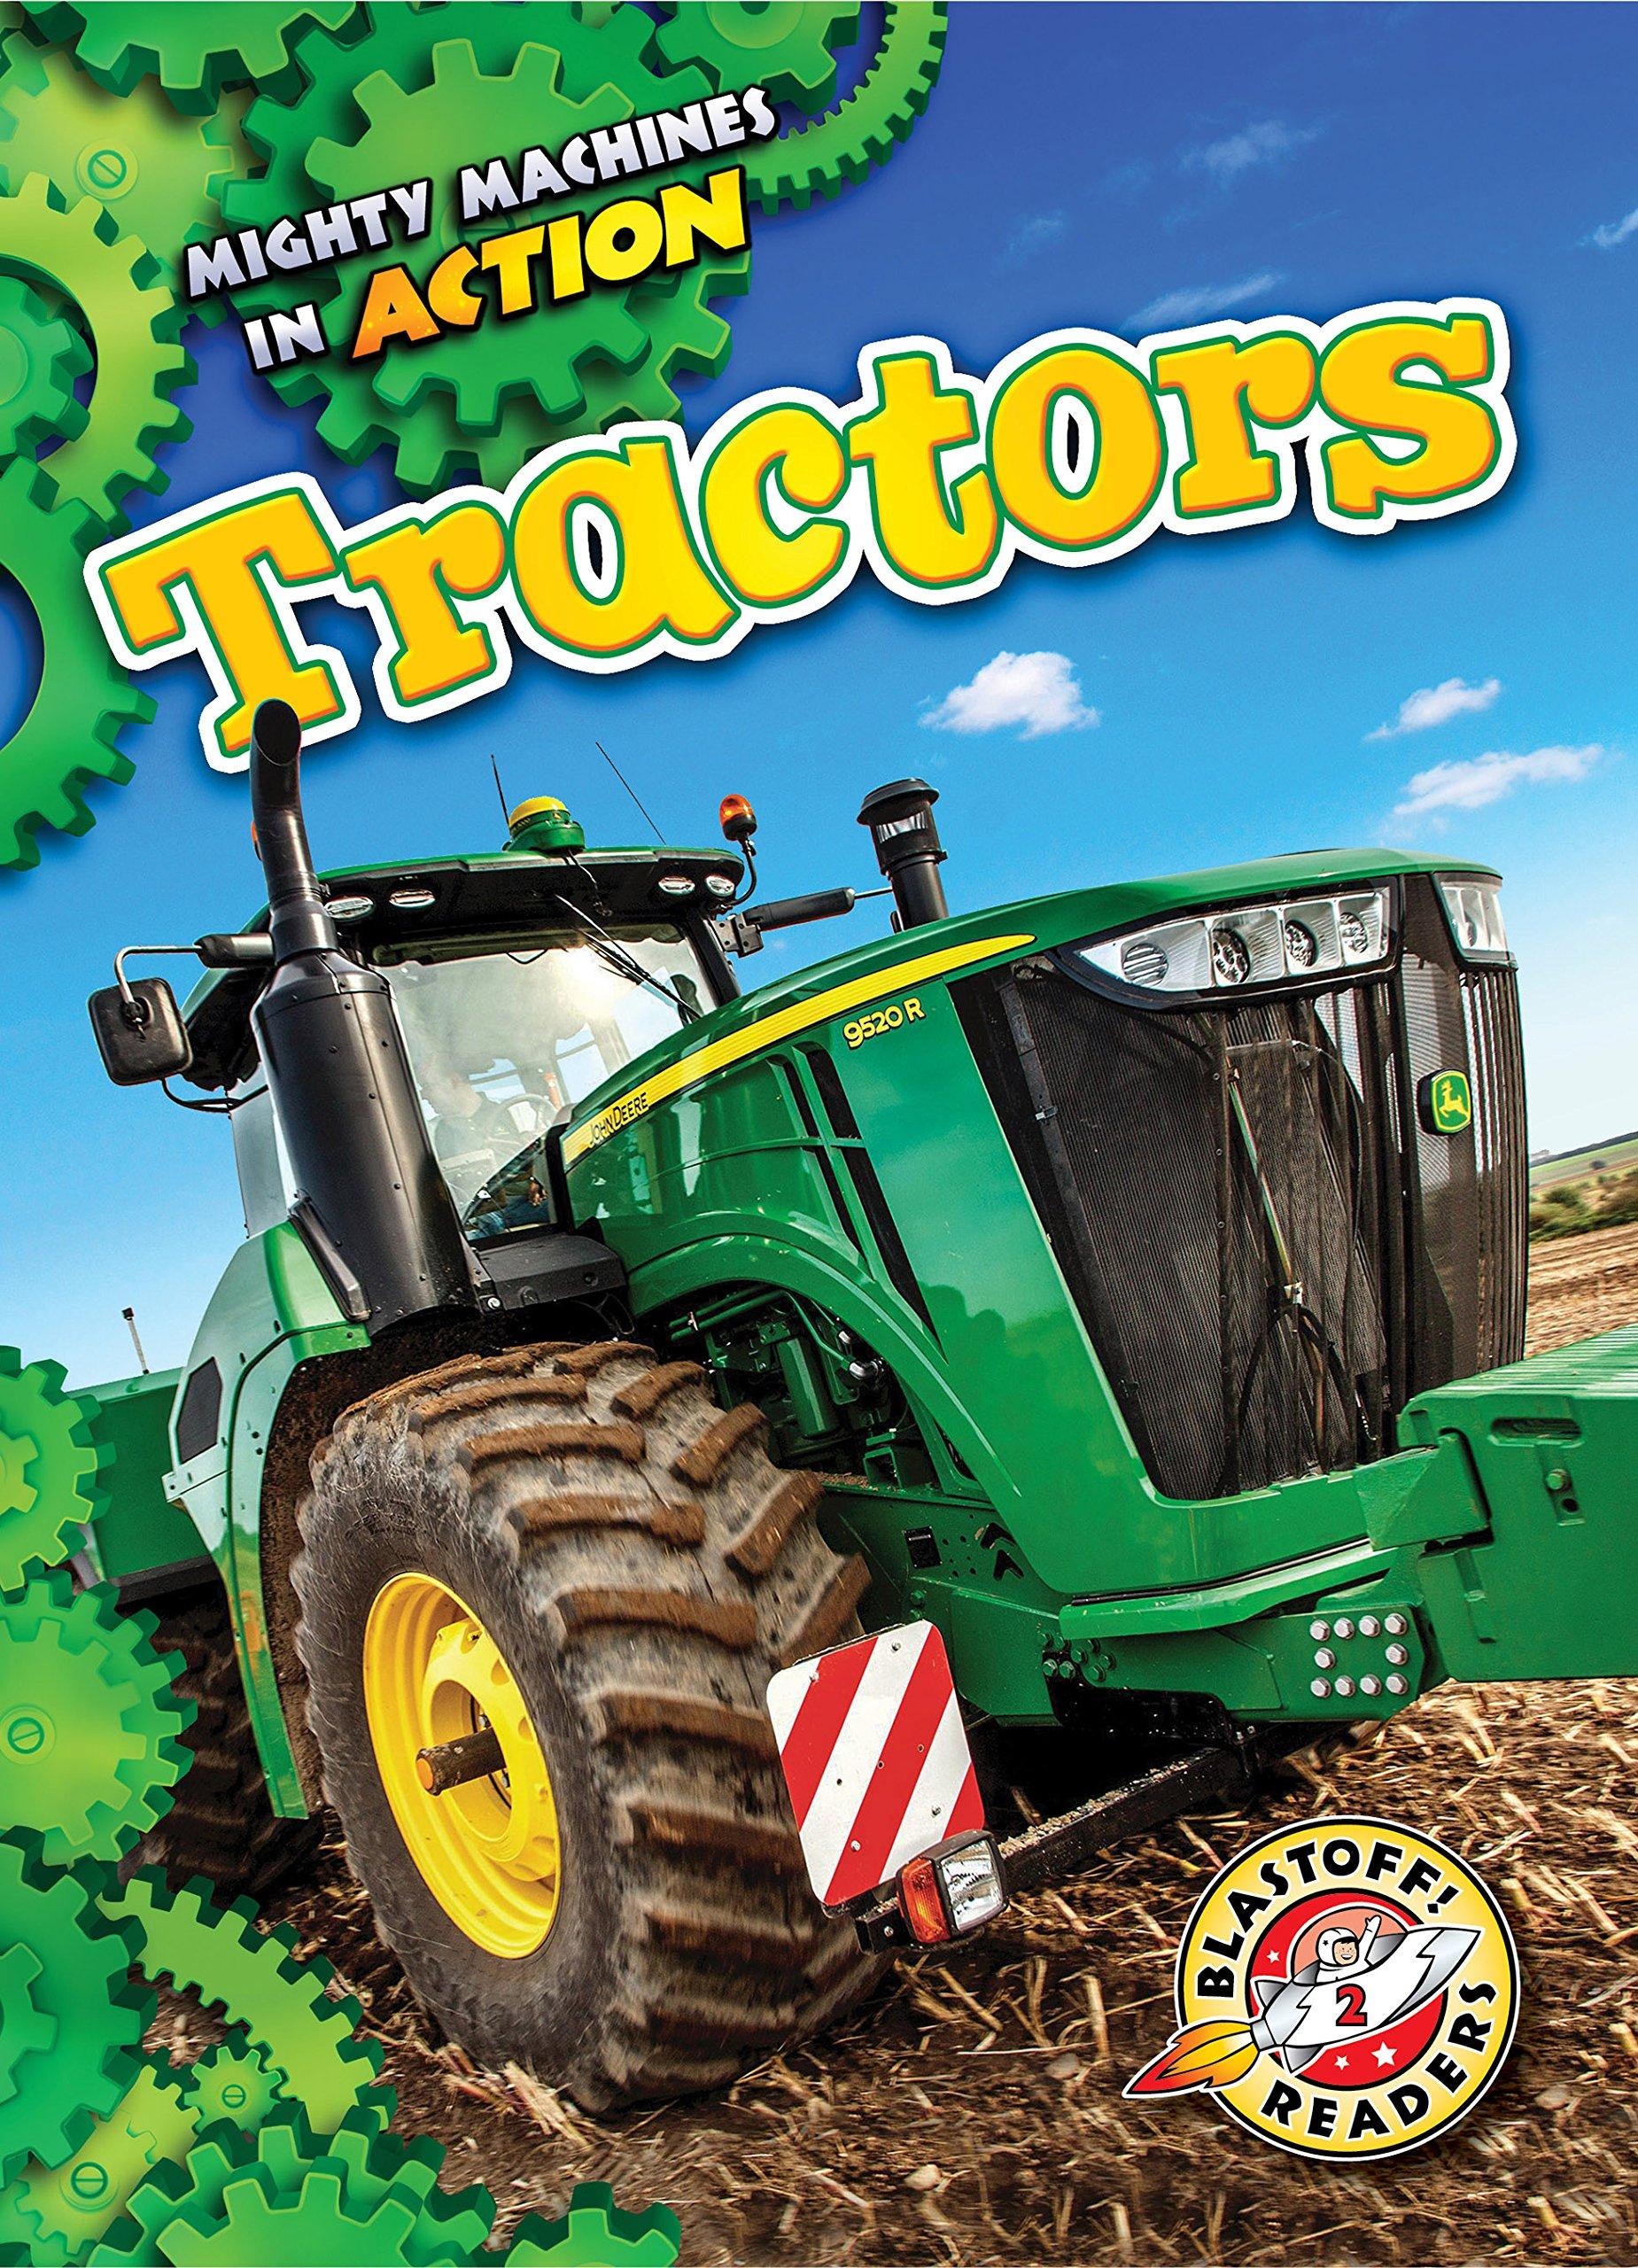 Tractors (Blastoff! Readers: Level 2: Mighty Machines in Action)